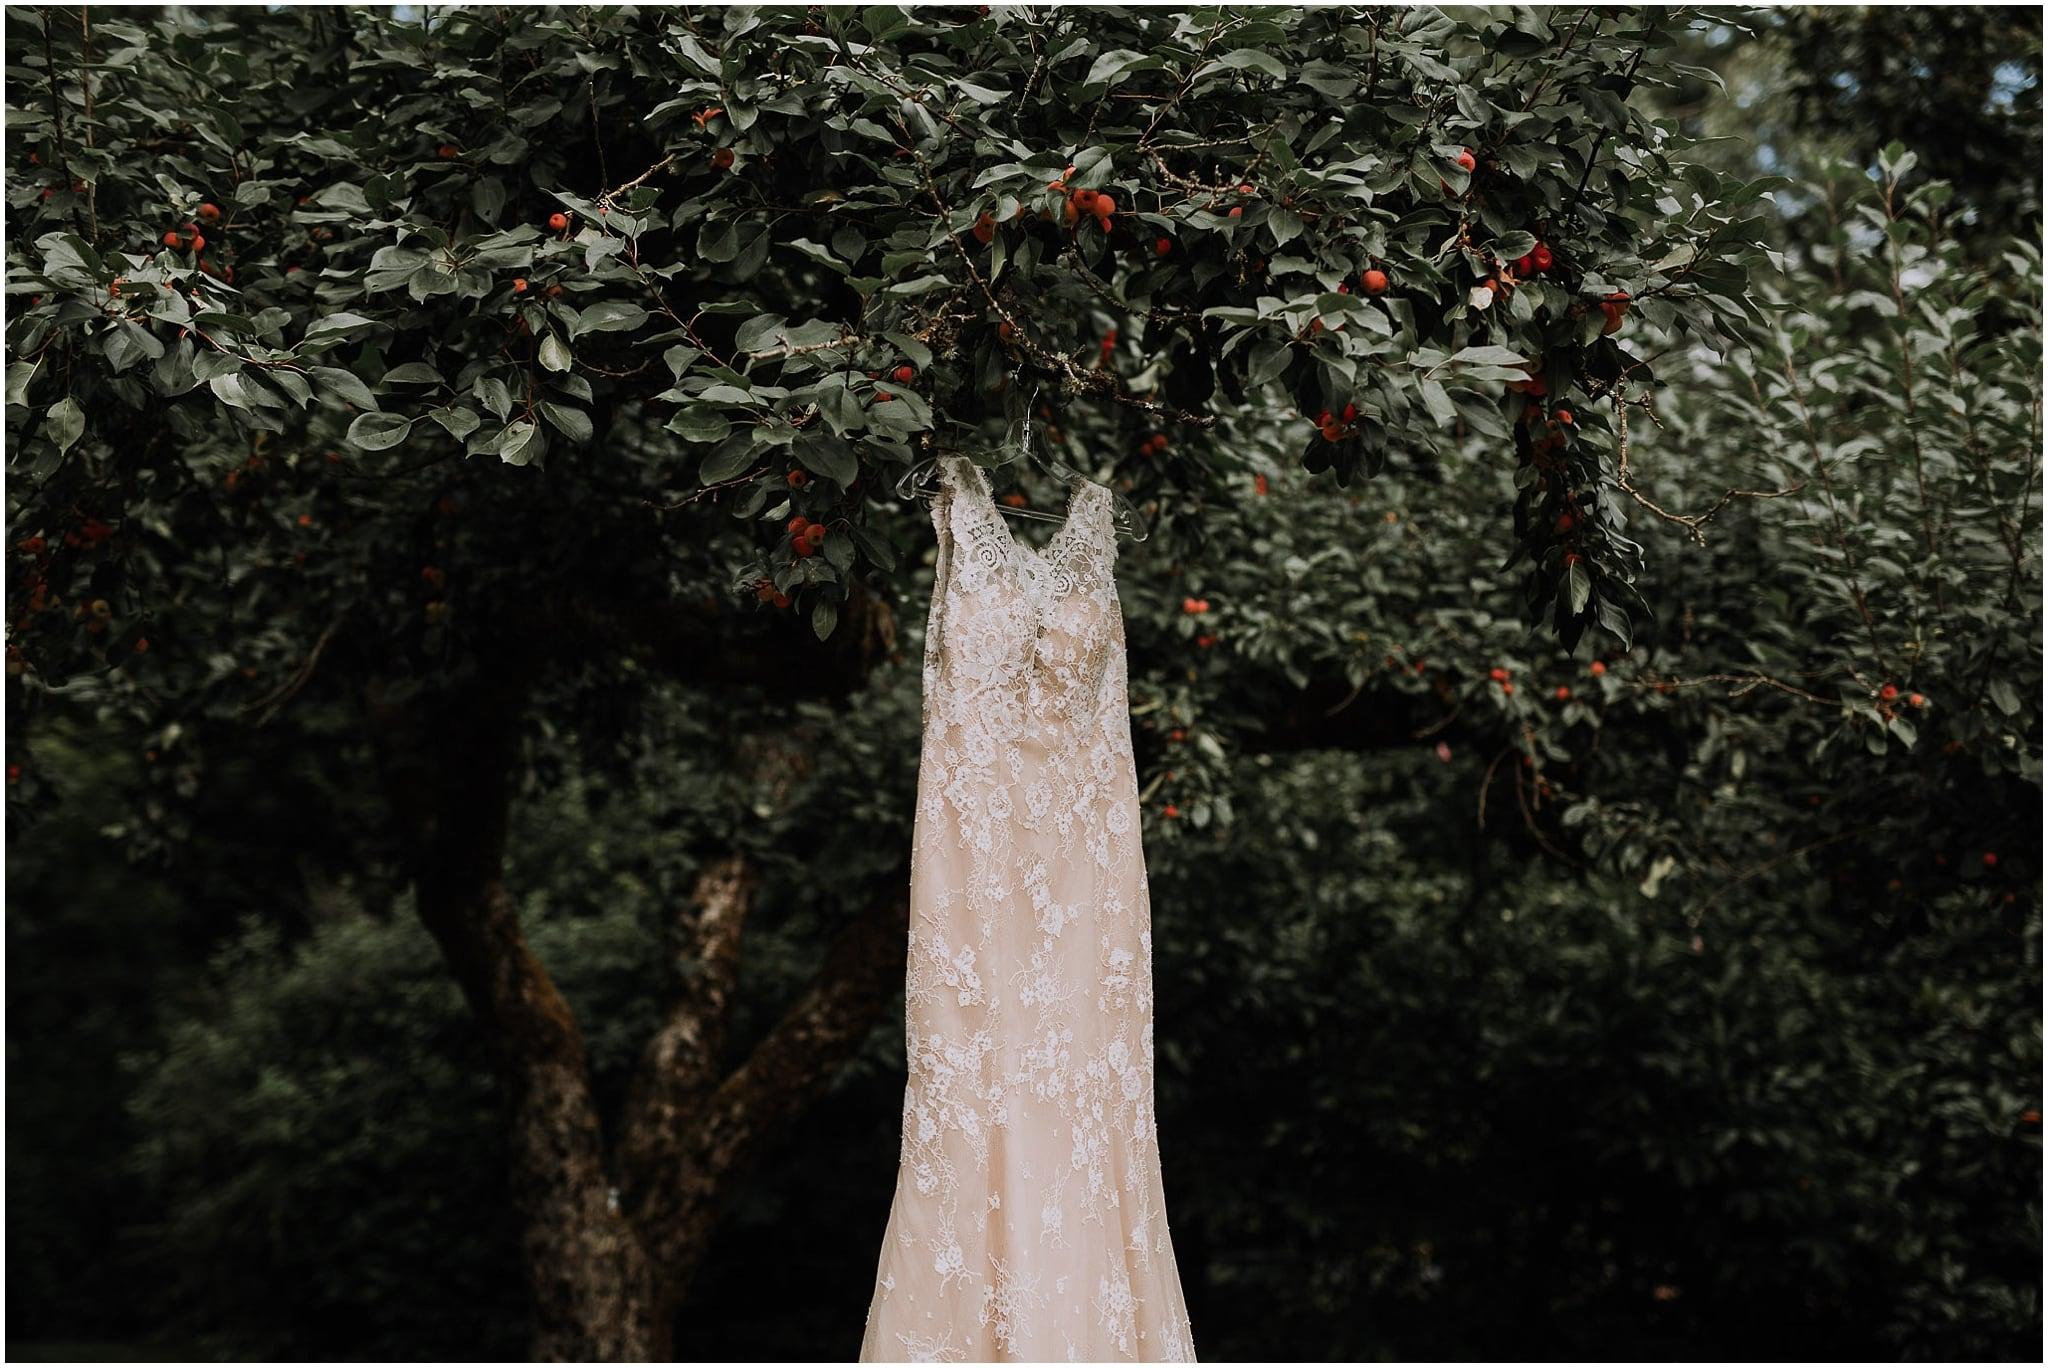 albee's garden, LGBT, wedding, olympia, kim butler